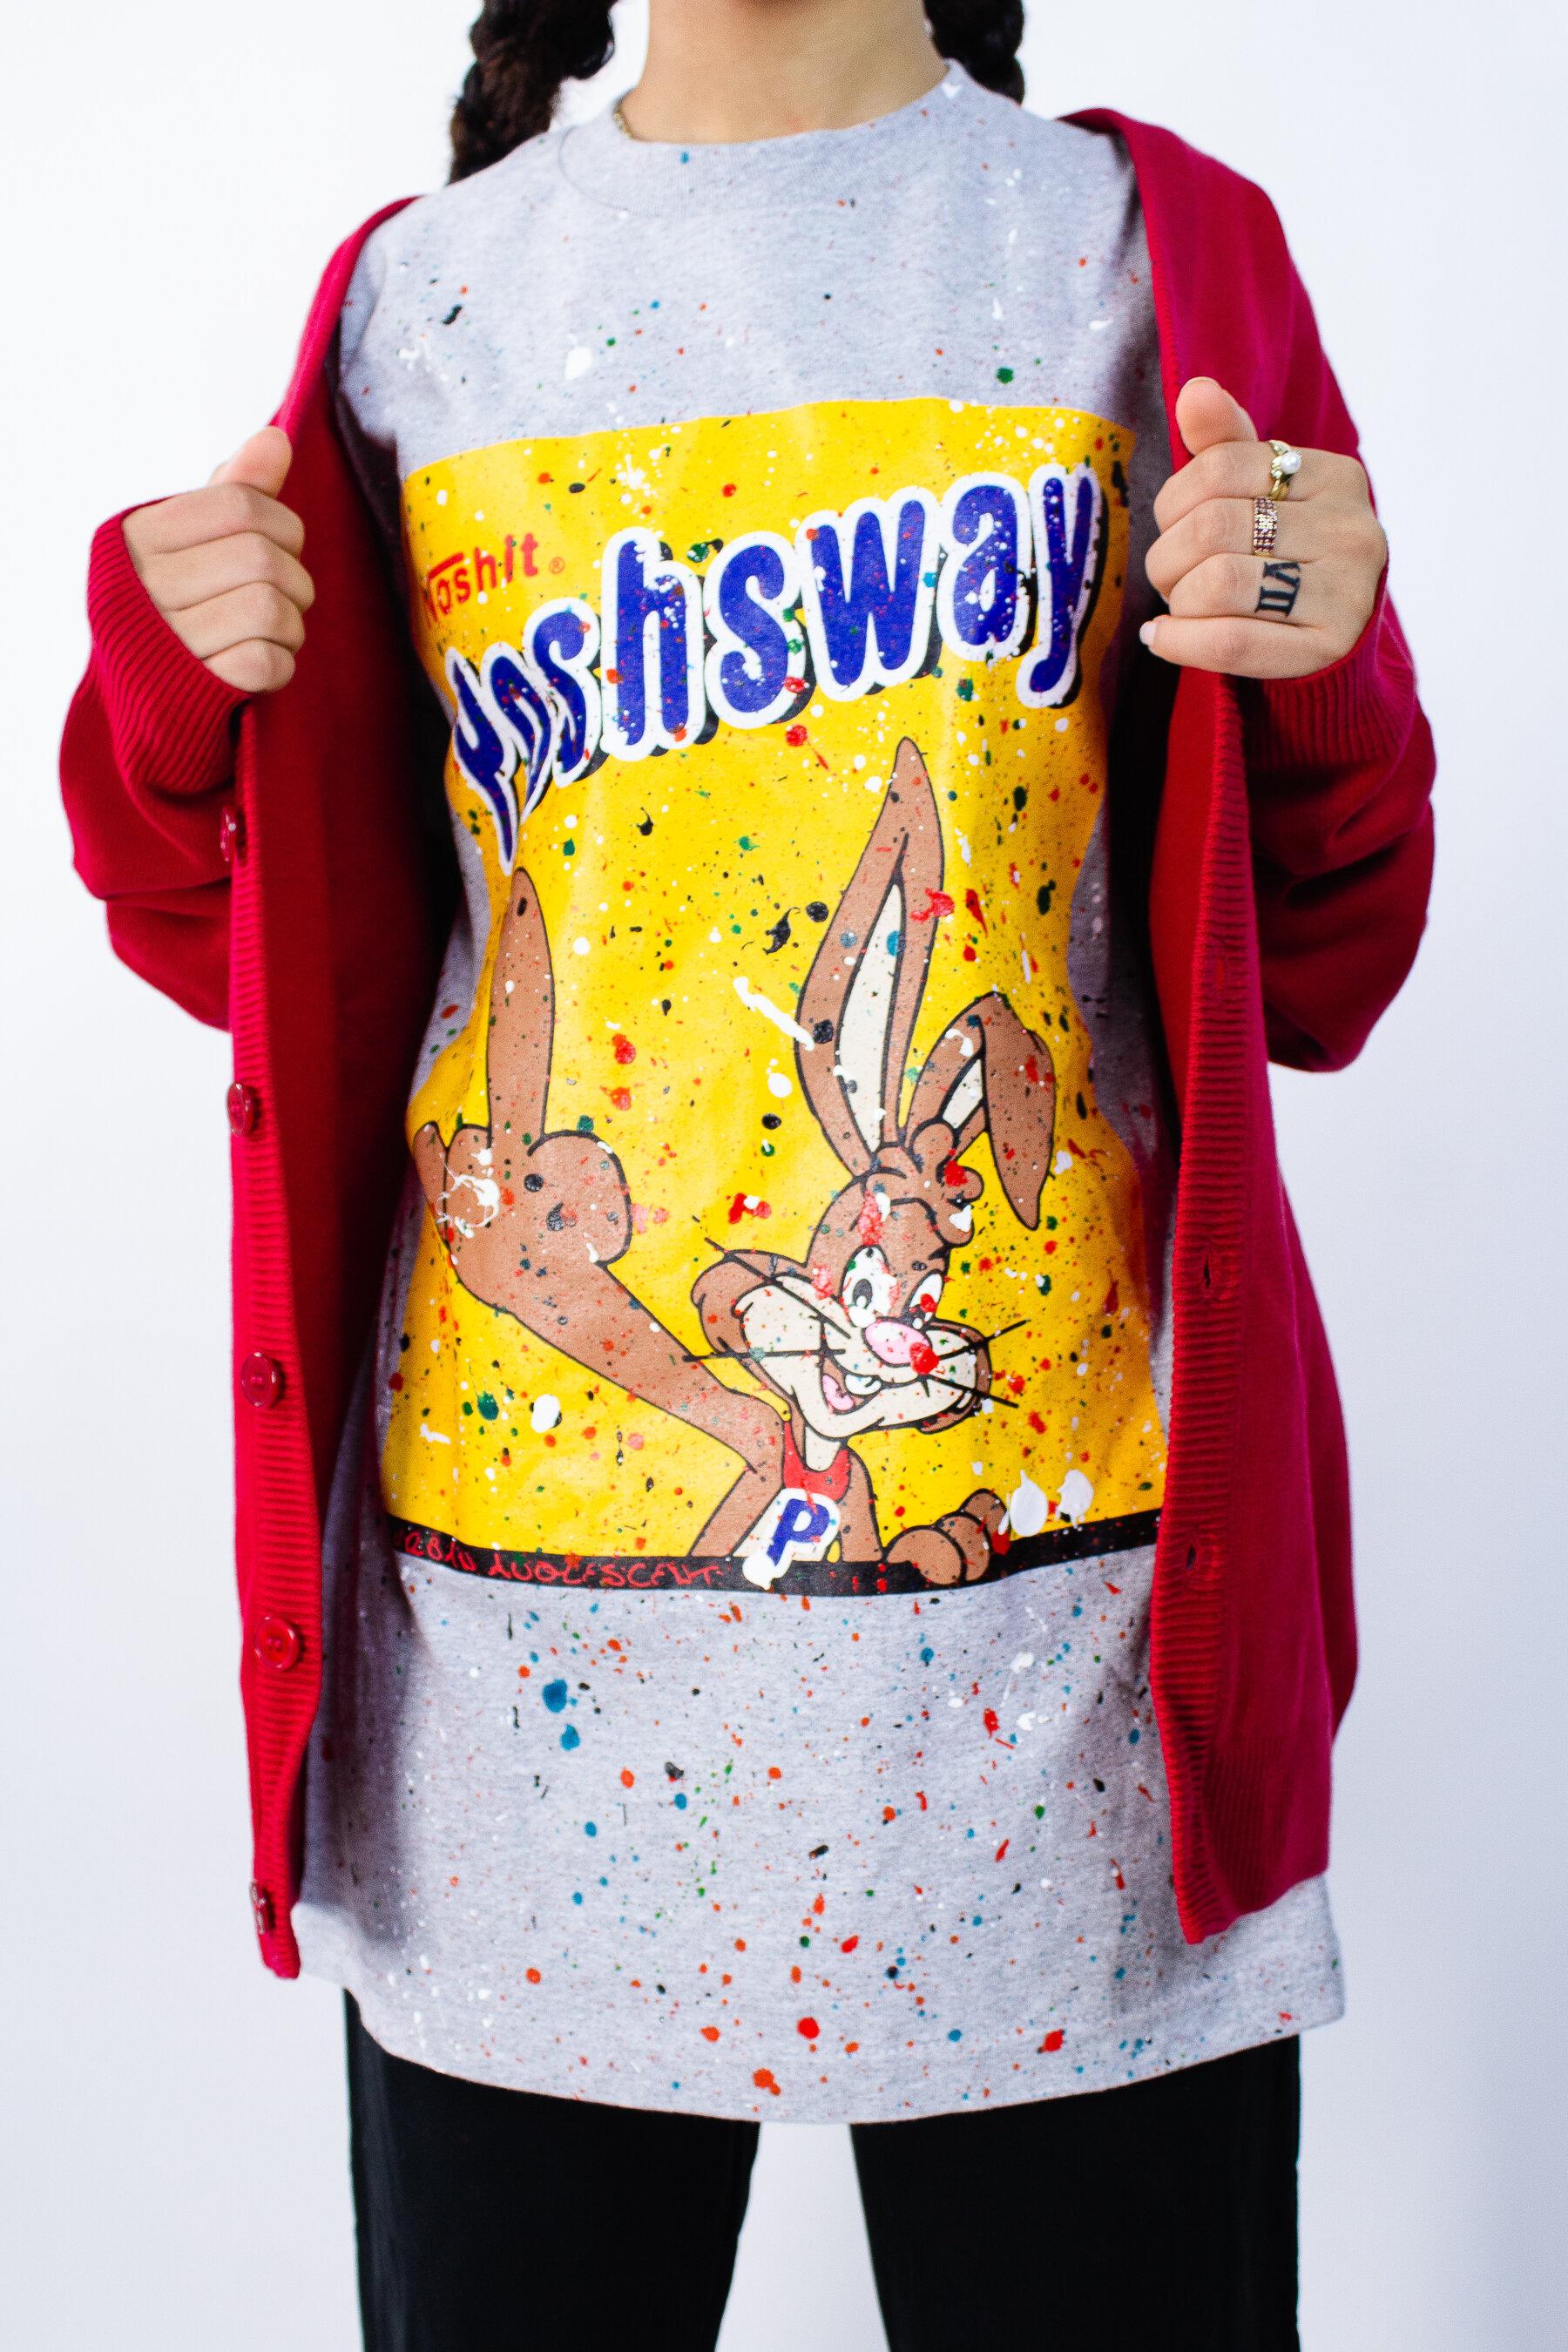 poshsway-2661.jpg